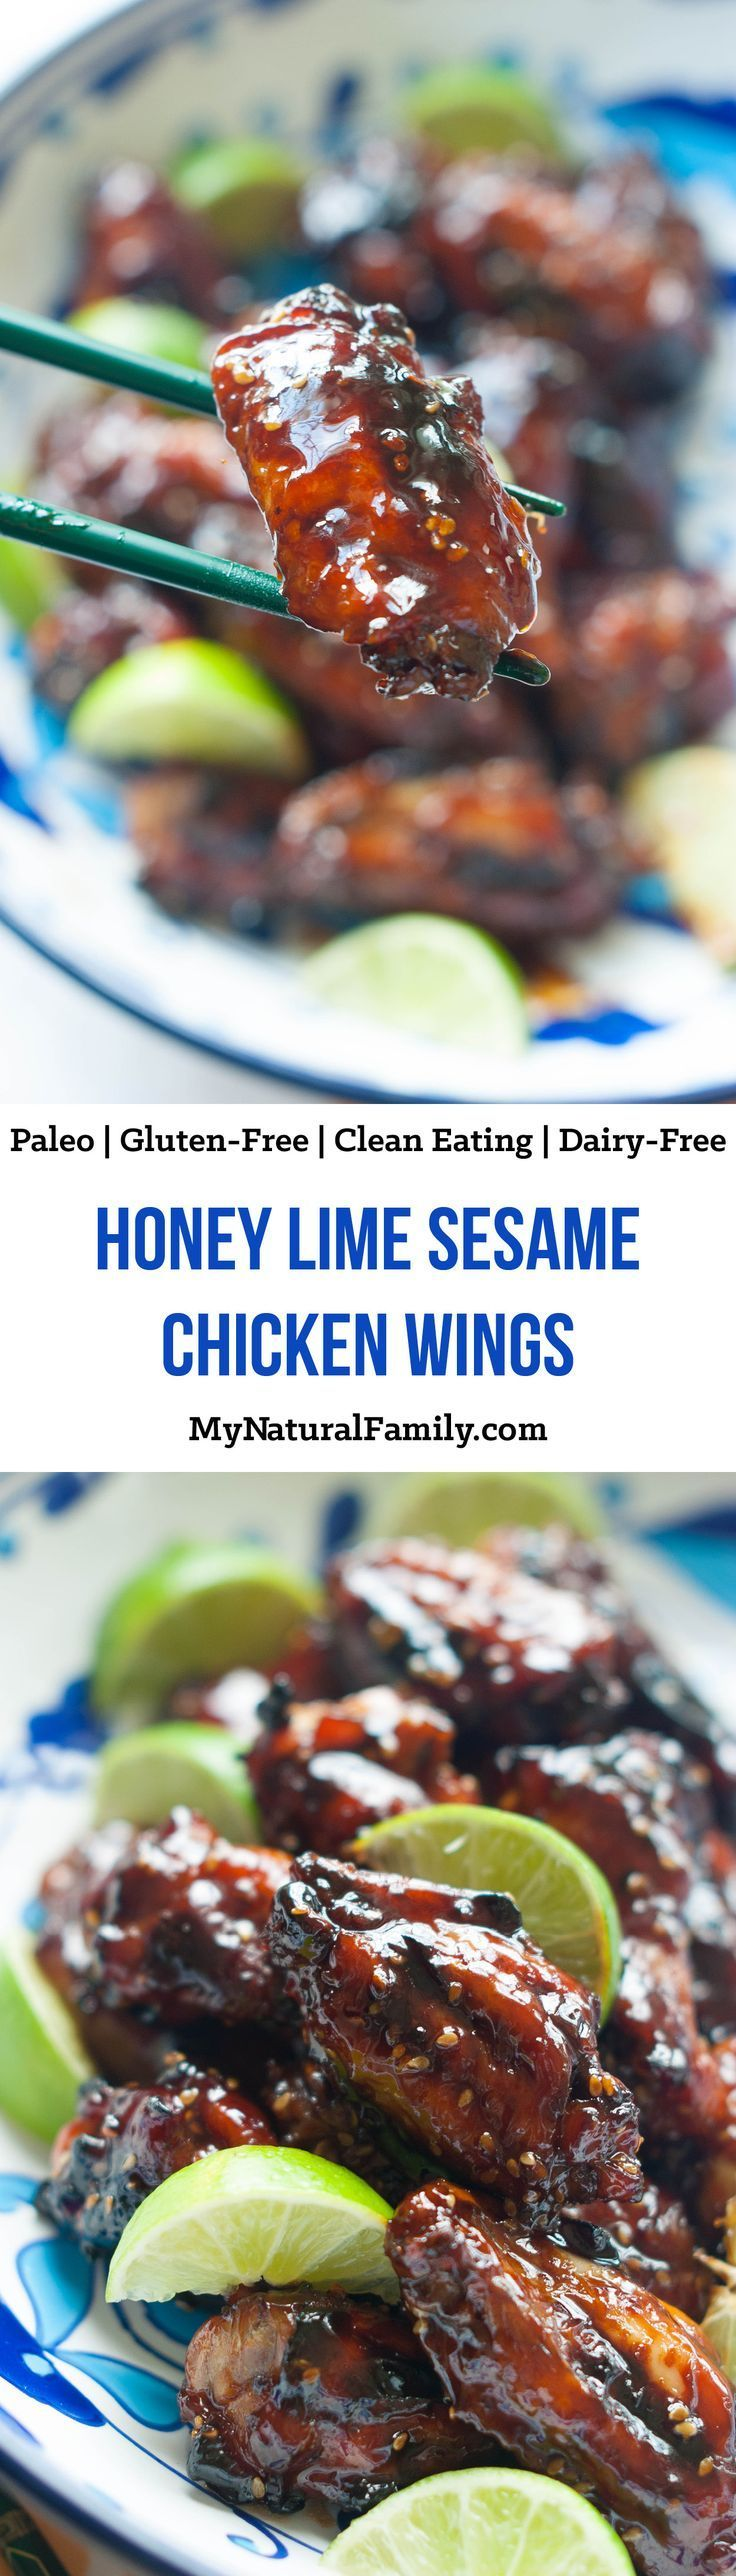 Honey Lime Sesame Chicken Wings Recipe (Paleo, Gluten Free, Clean Eating, Dairy…